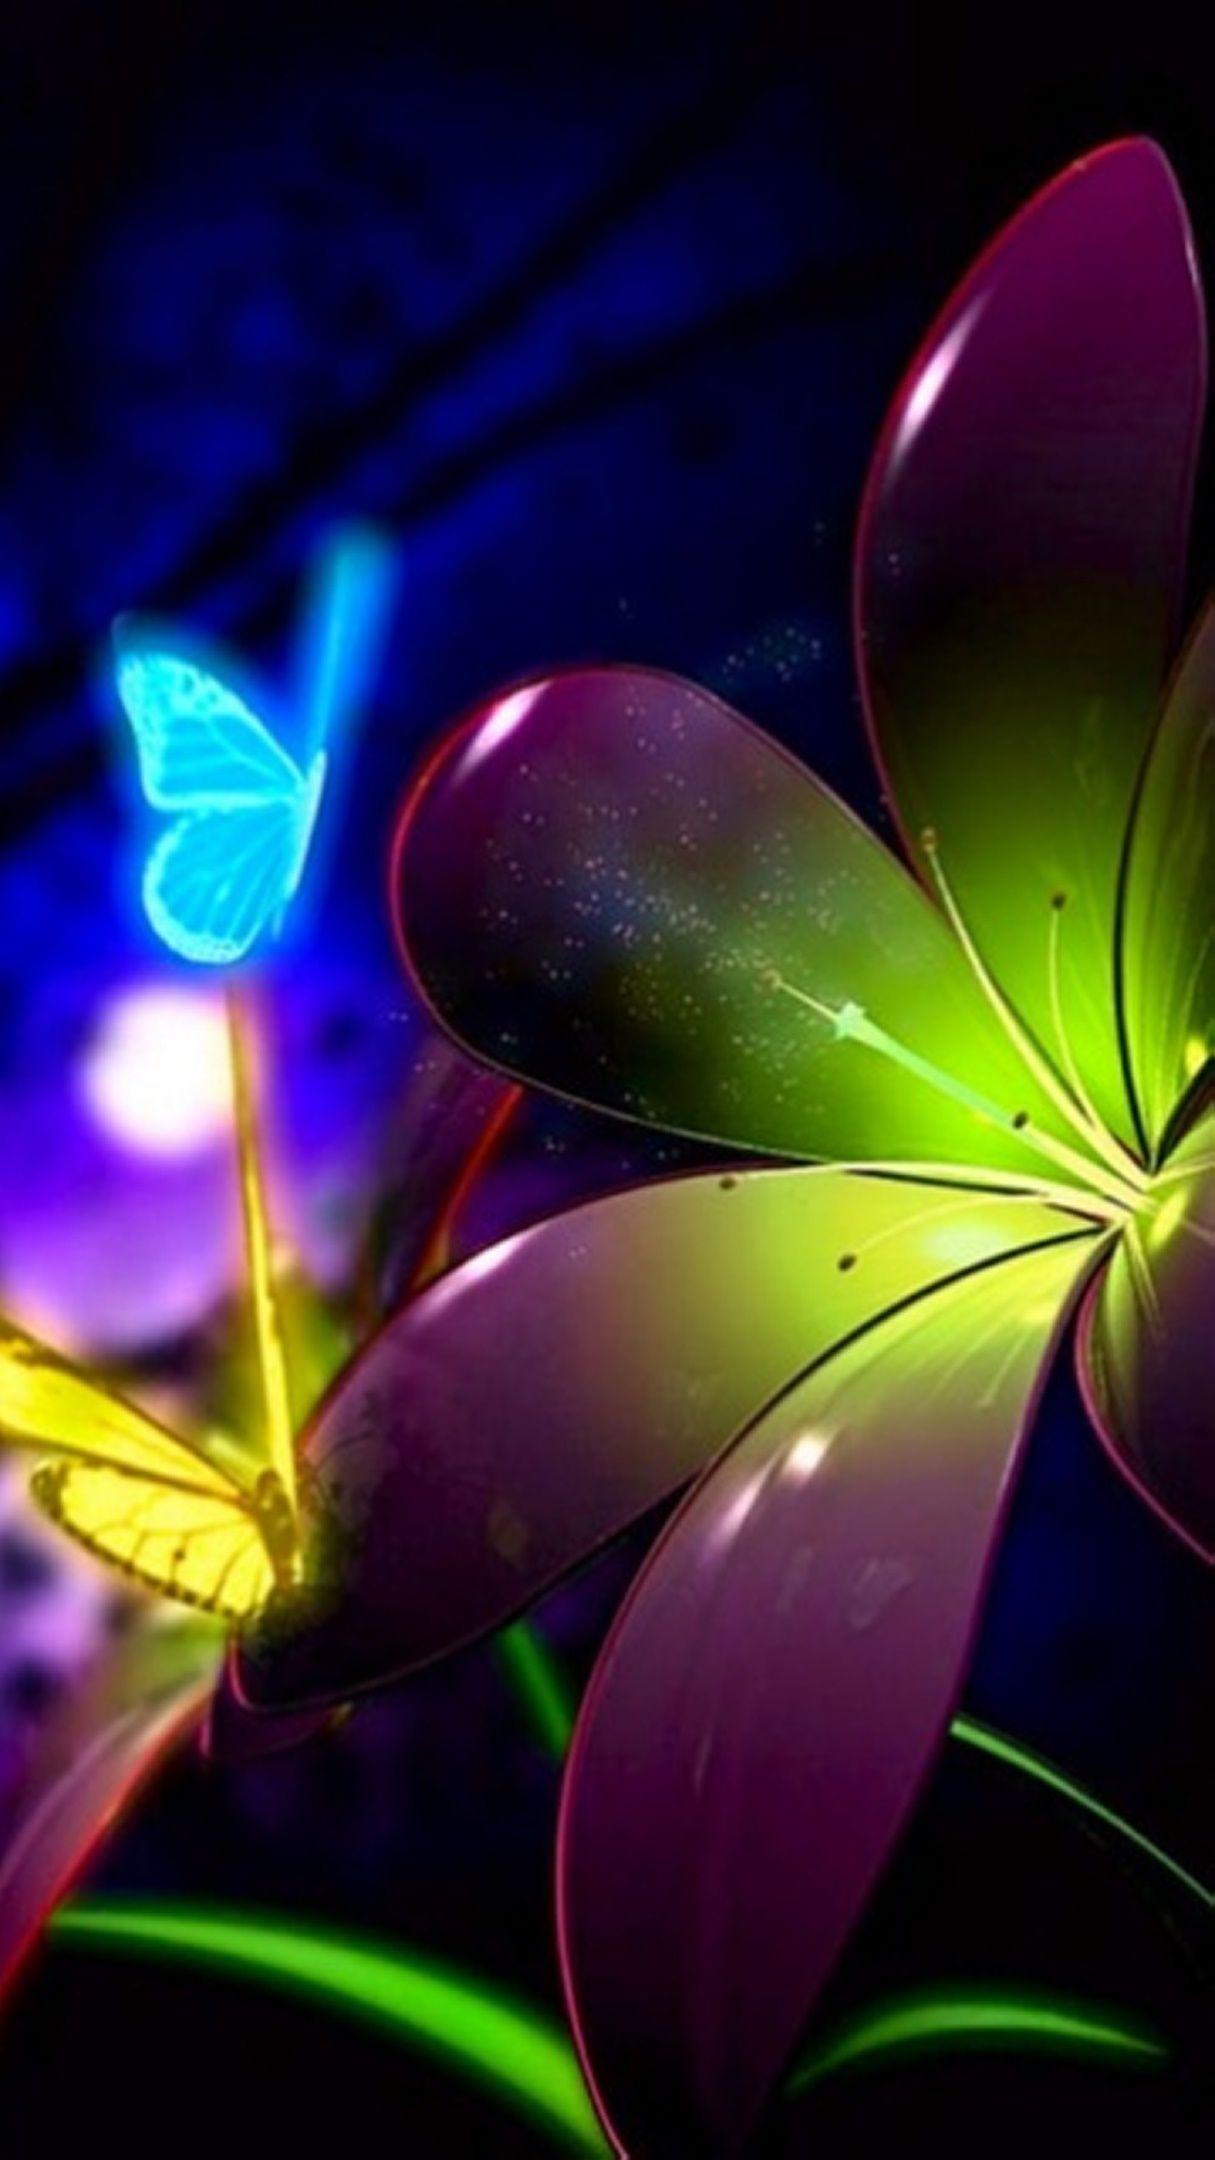 صور خلفيات ايفون جديدة دقة عالية روعة 2019 New Backgrounds For Tecnologis Abstract Art Images Blue Flower Wallpaper Colorful Abstract Art